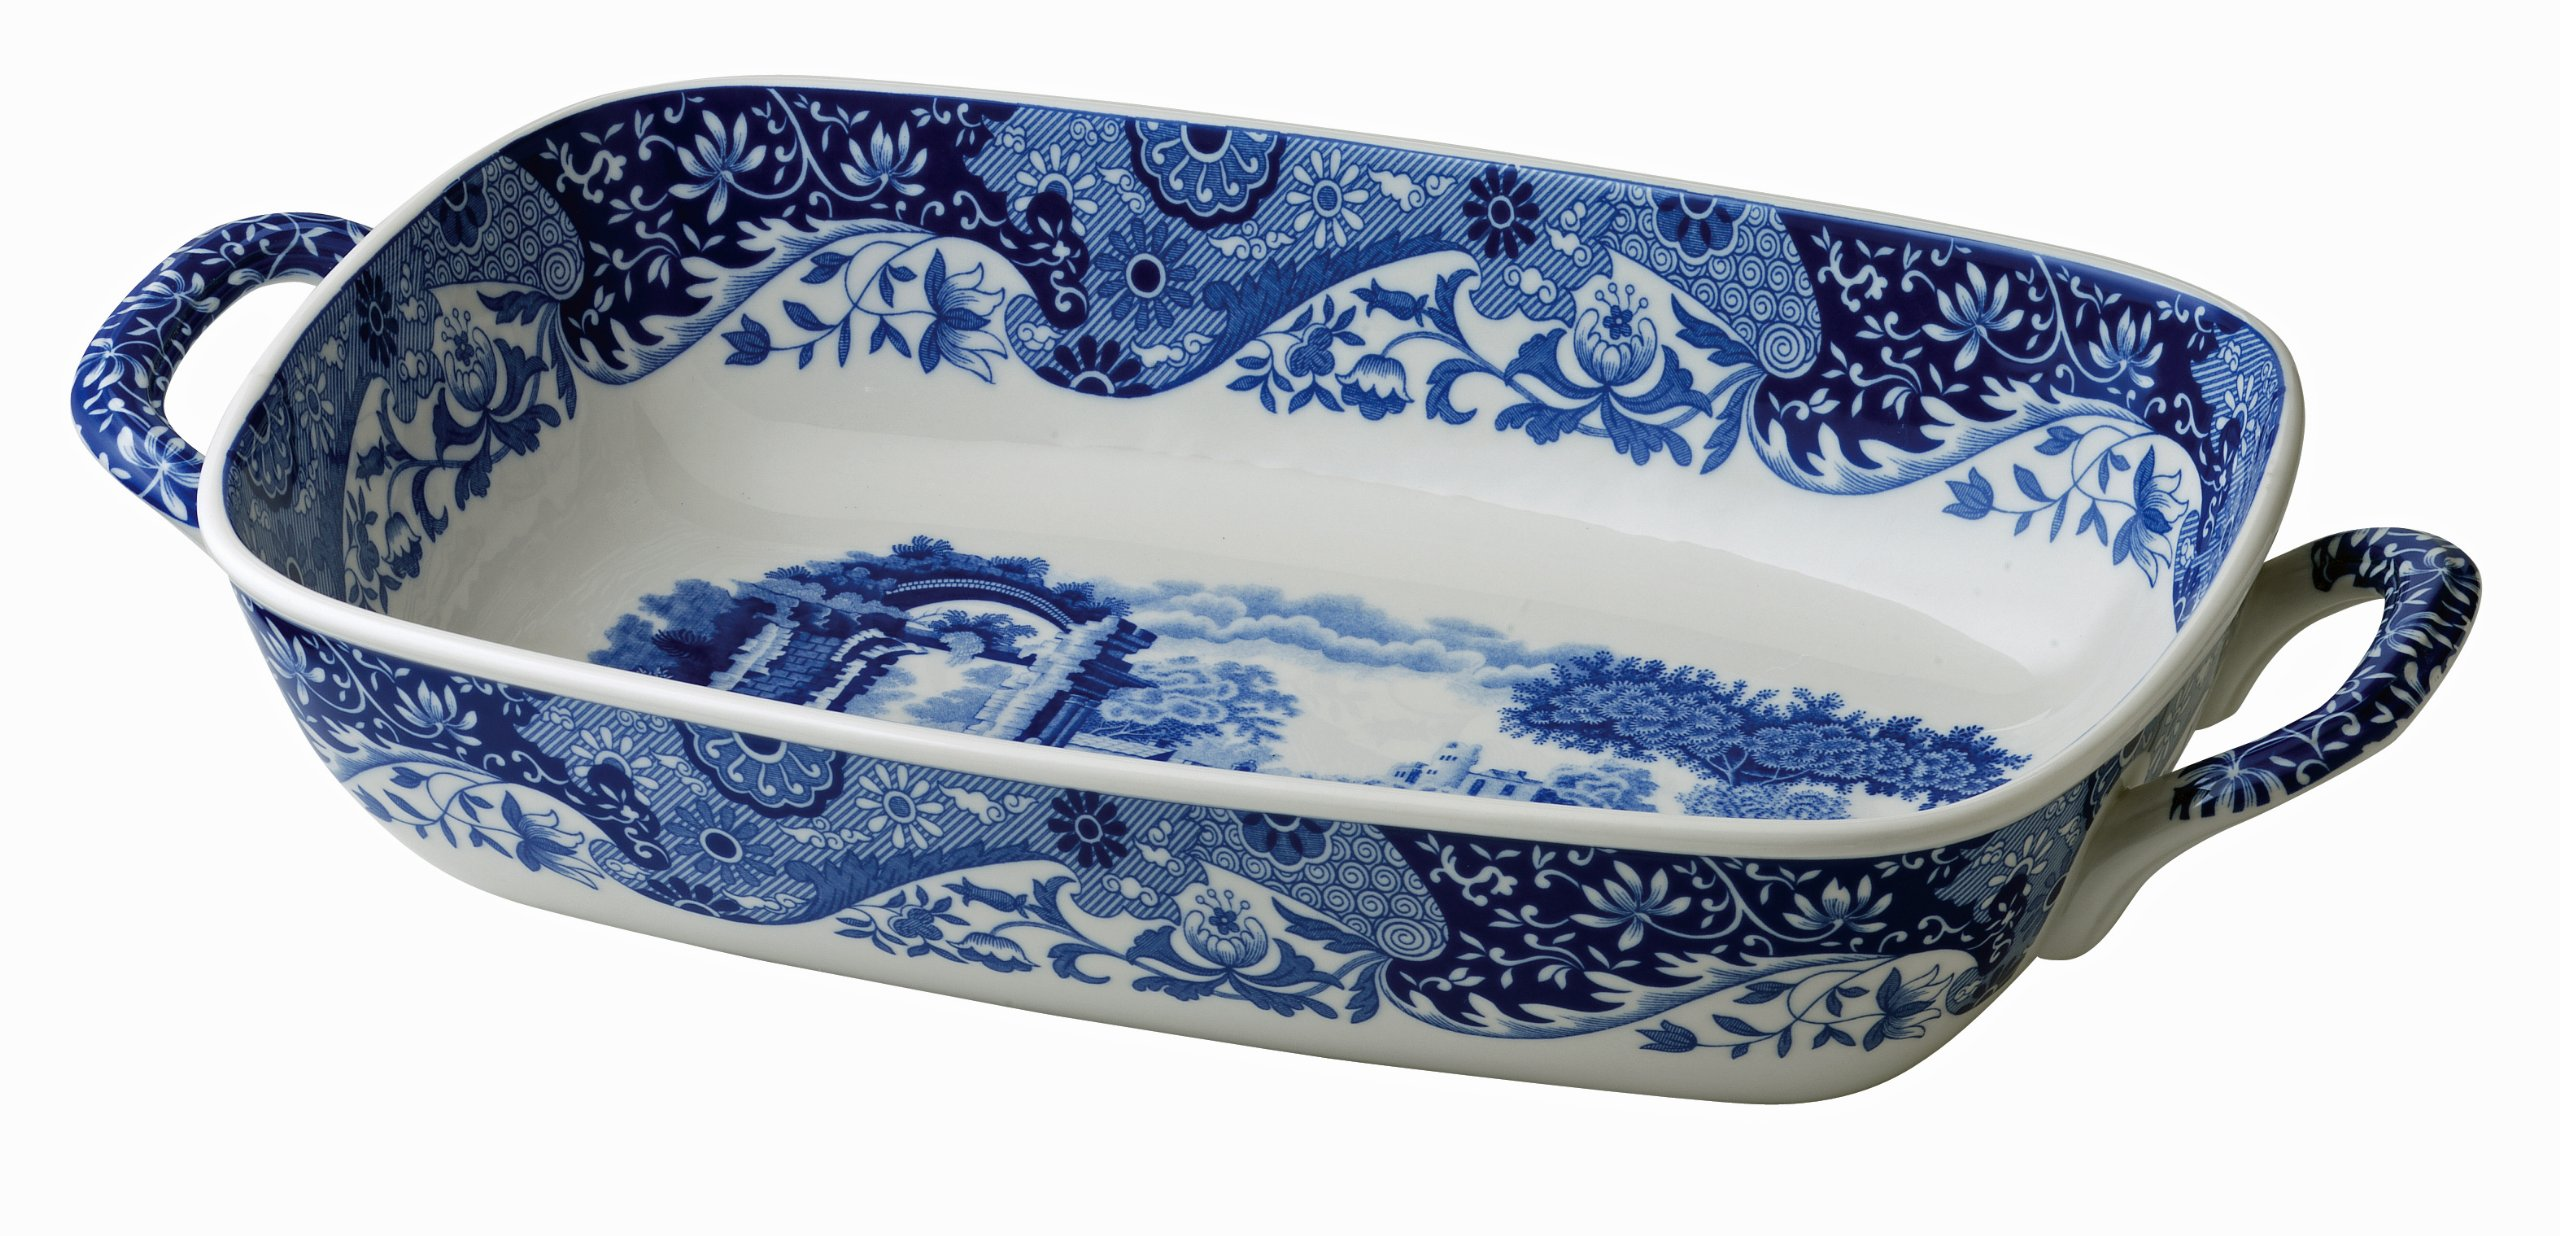 Spode Blue Italian Handled Serving Dish